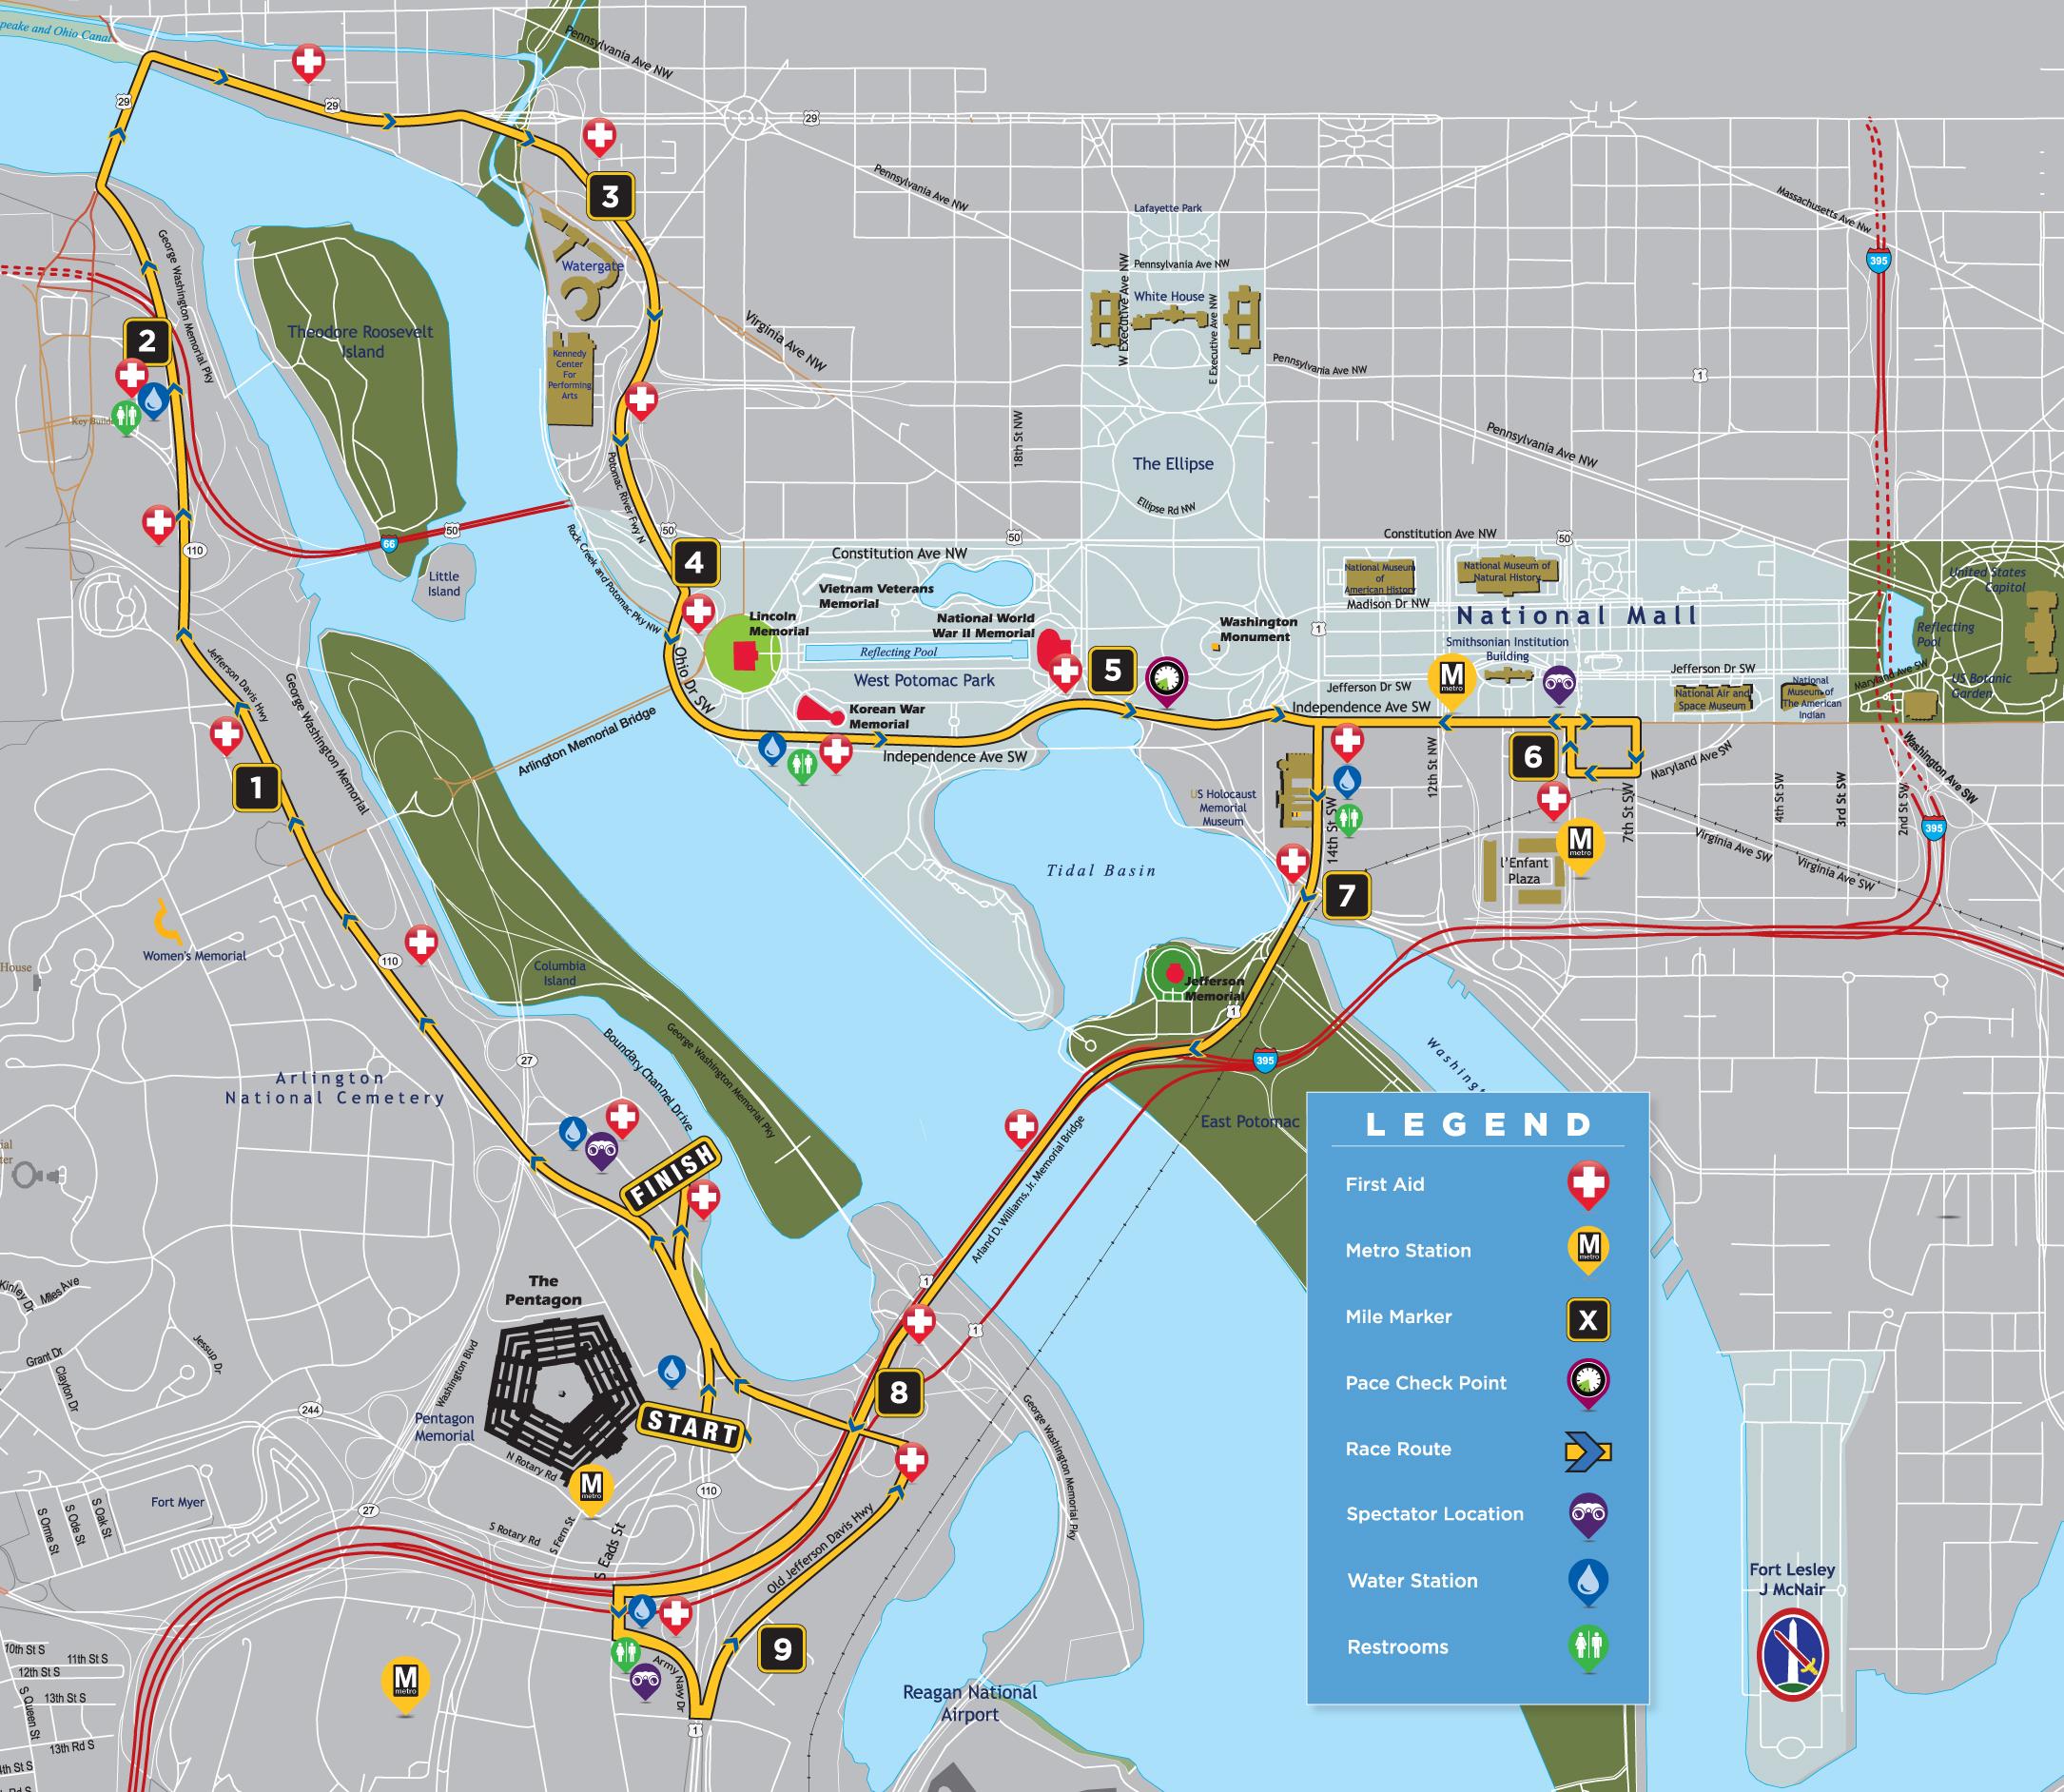 2018-Course-map_2018_w_Legend.jpg